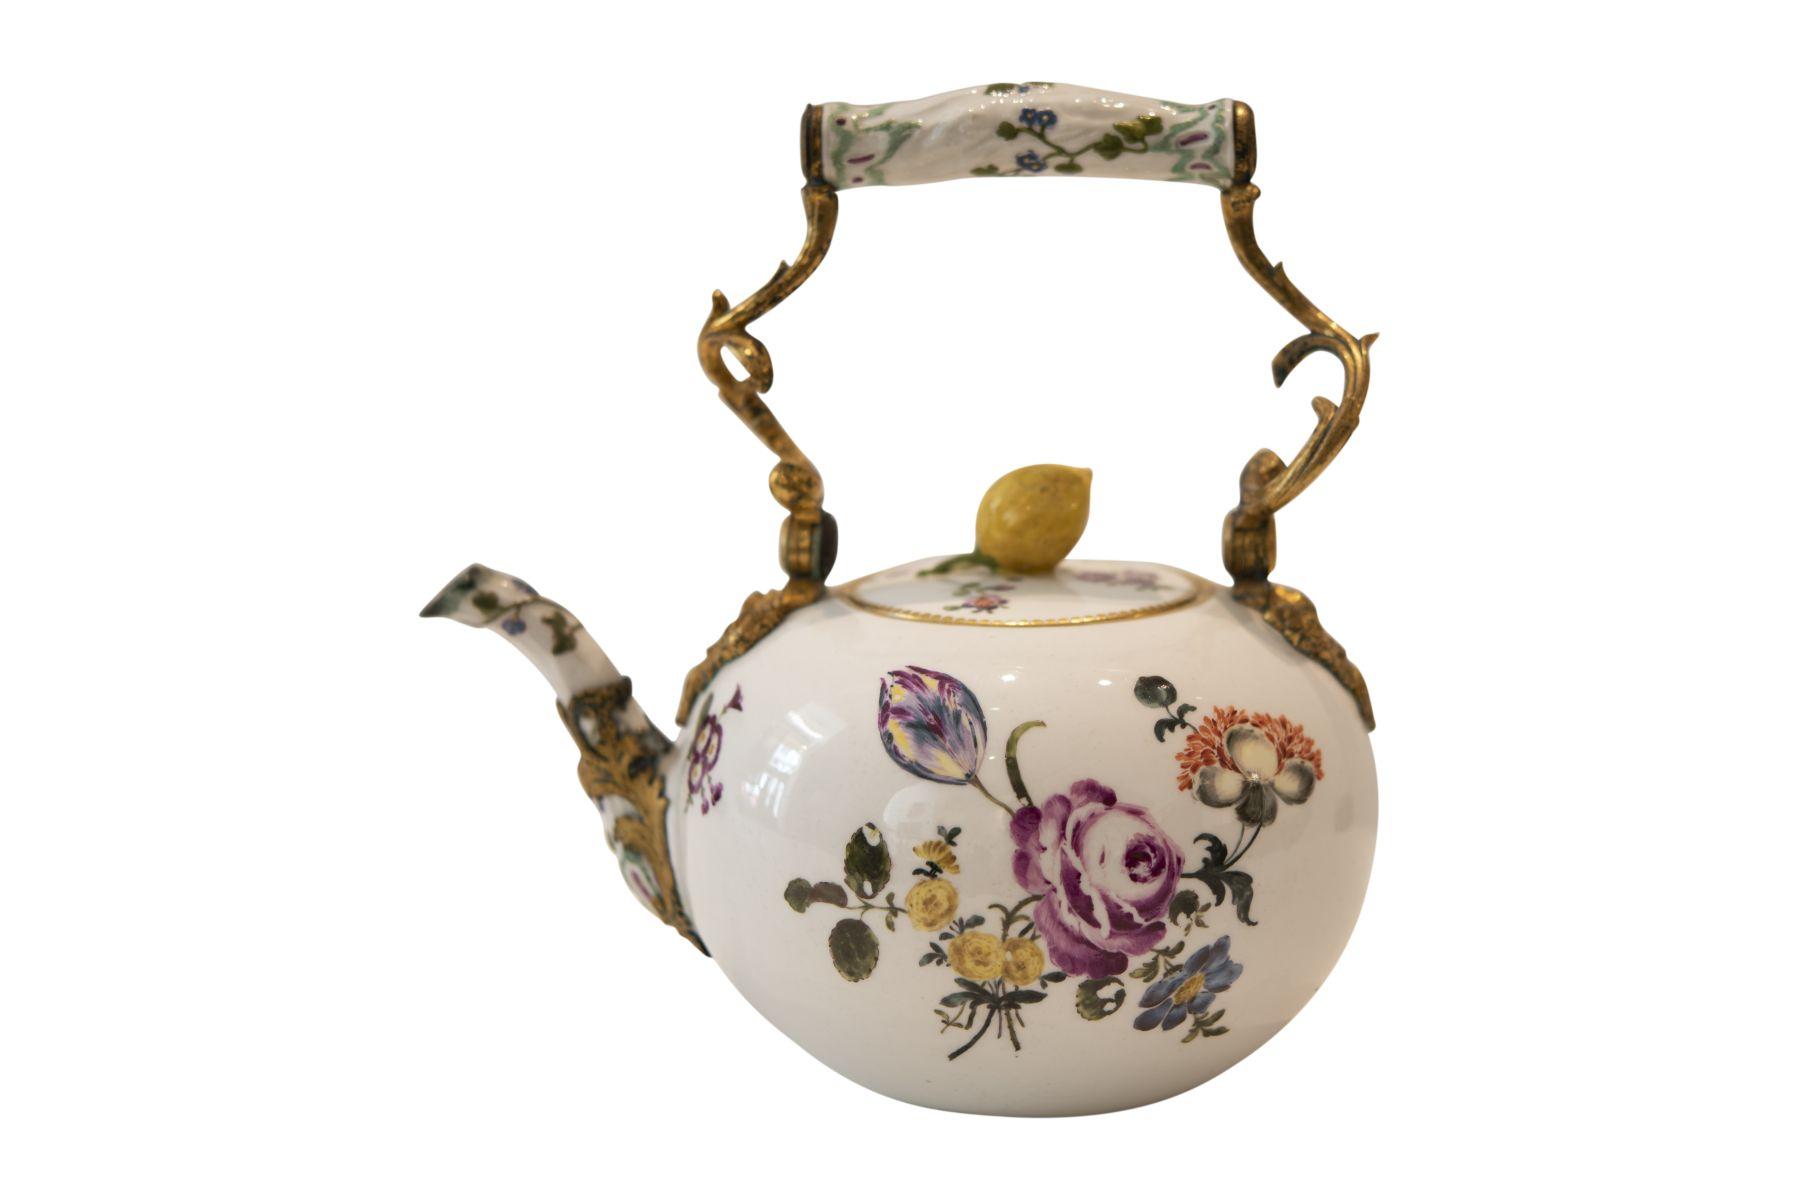 #239 Large teapot 19th century | Große Teekanne Anfang 19. Jahrhundert Image